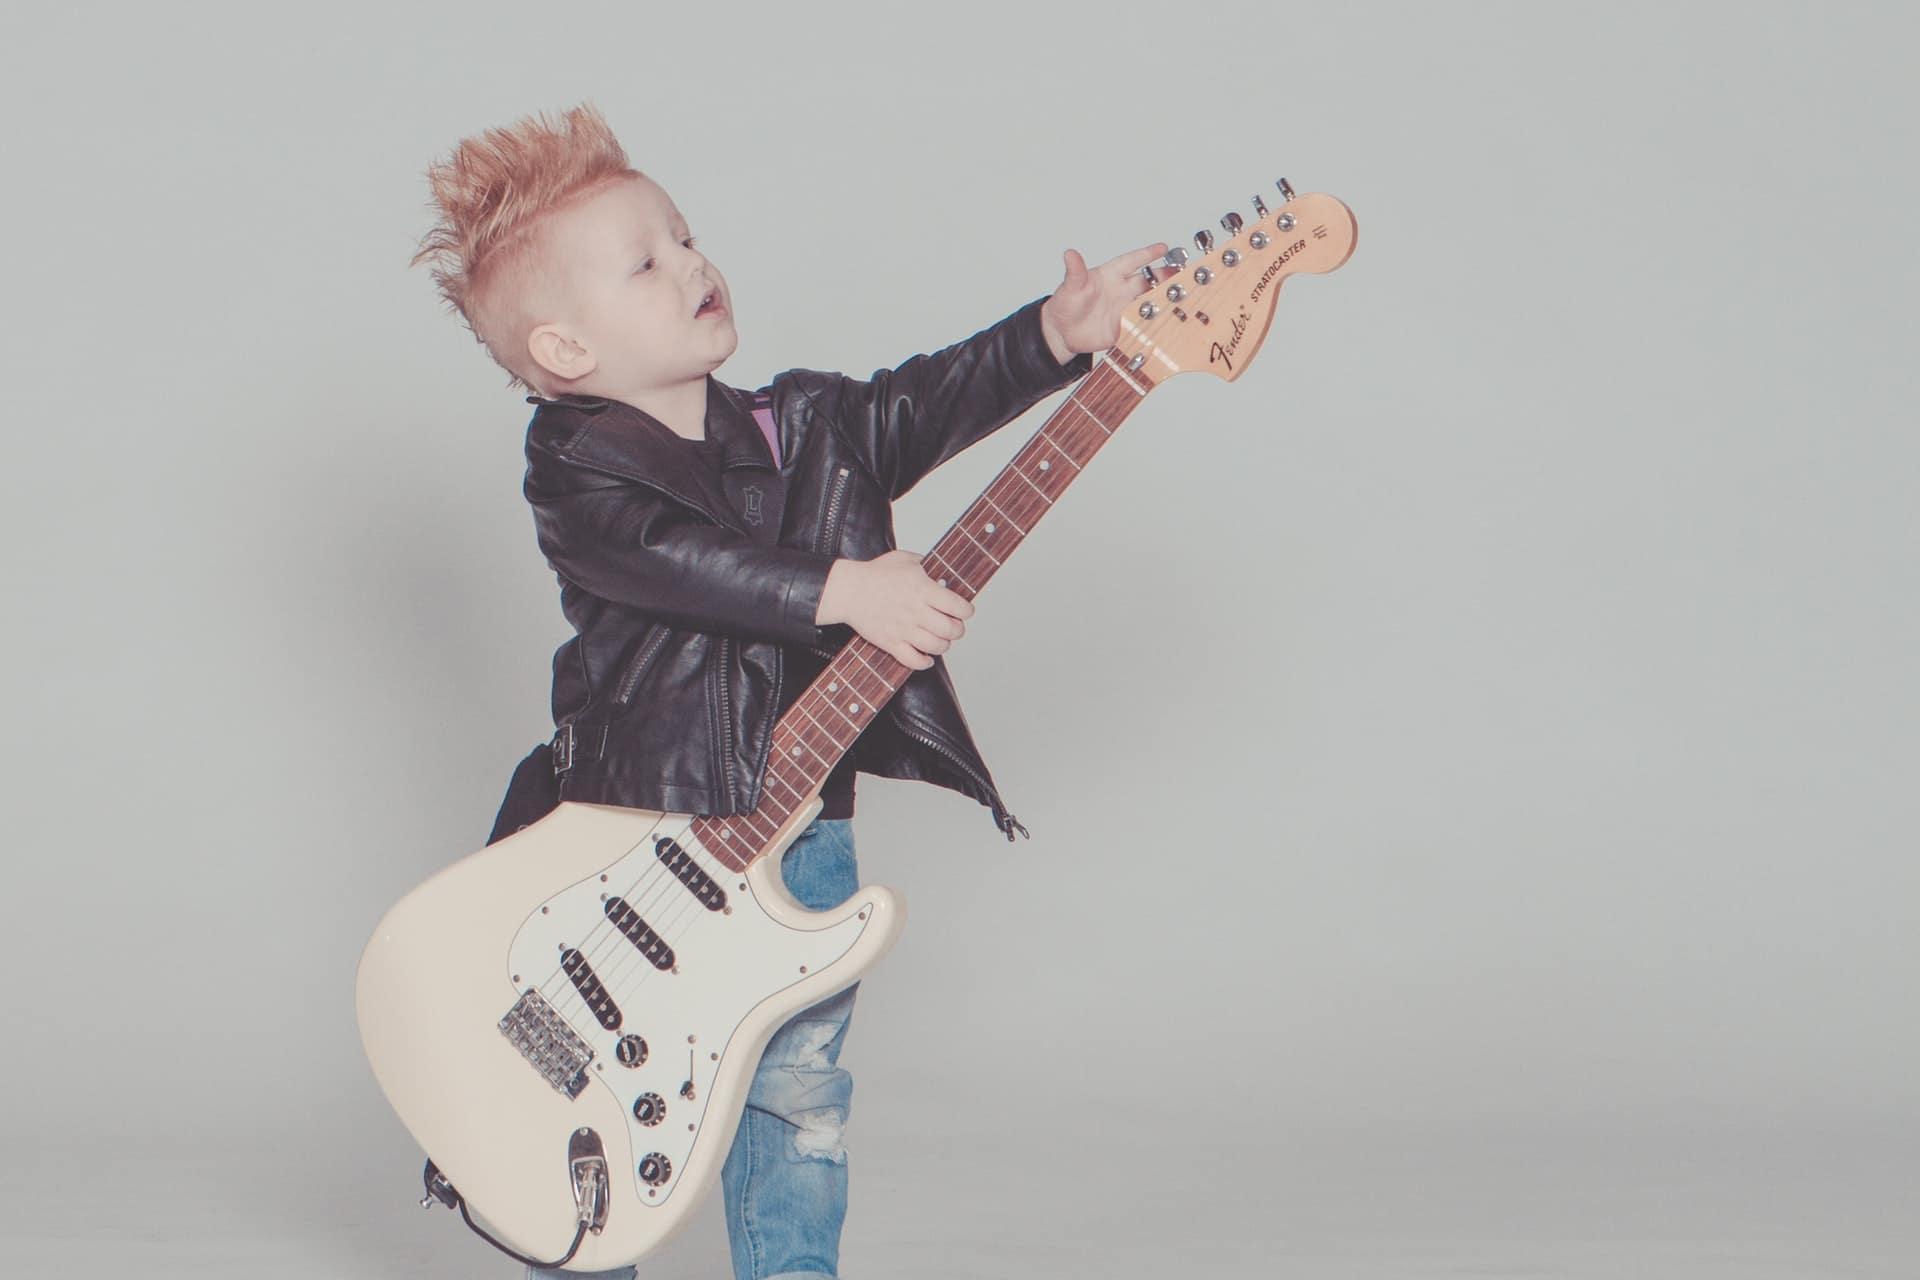 kindergitarre-kind-haelt-e-gitarre